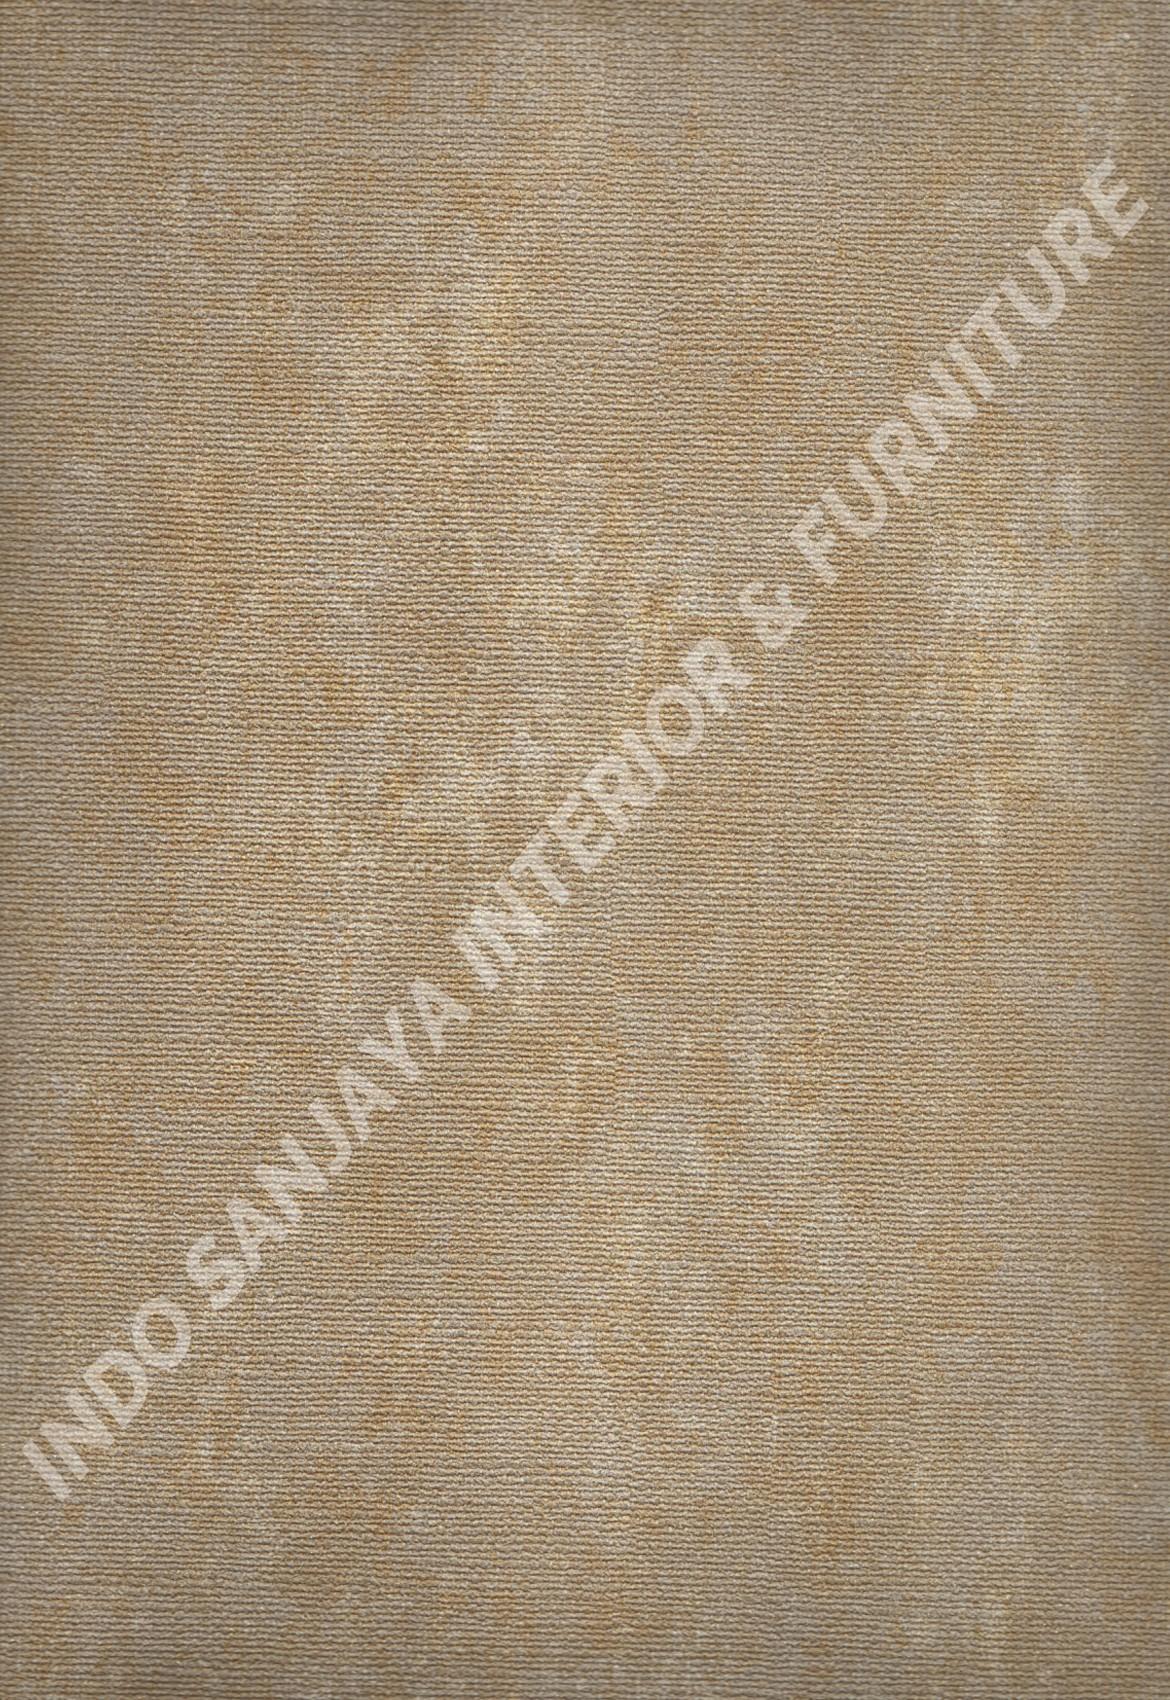 wallpaper   Wallpaper Minimalis Polos DL13204:DL13204 corak  warna